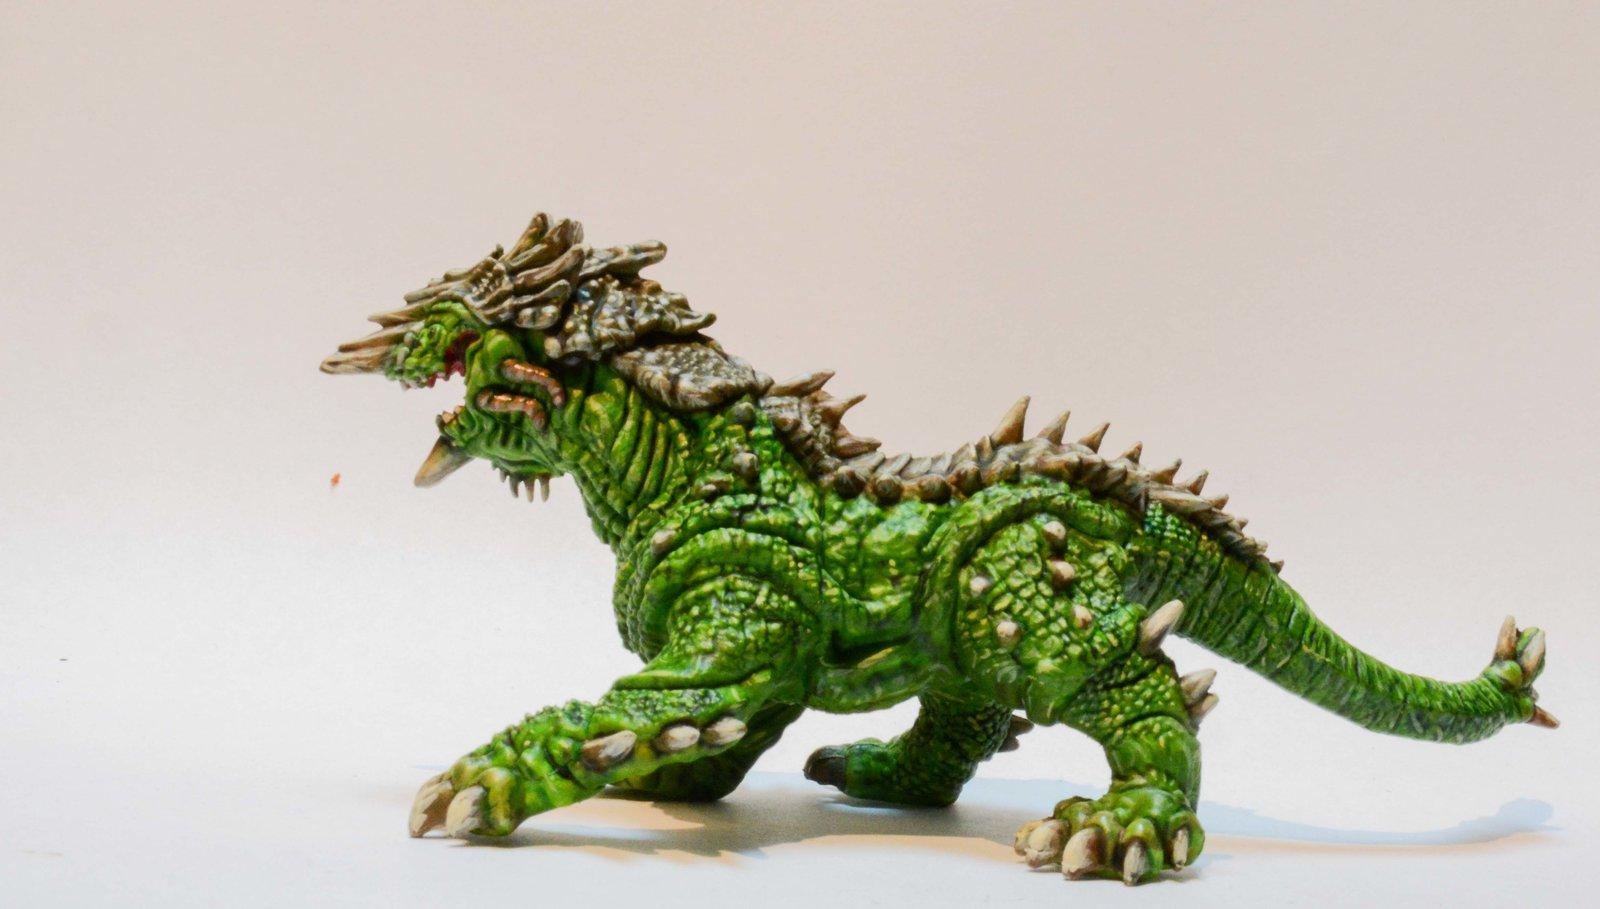 large.dragon-0099.JPG.dc594003f67da7657d587b73ff044941.JPG